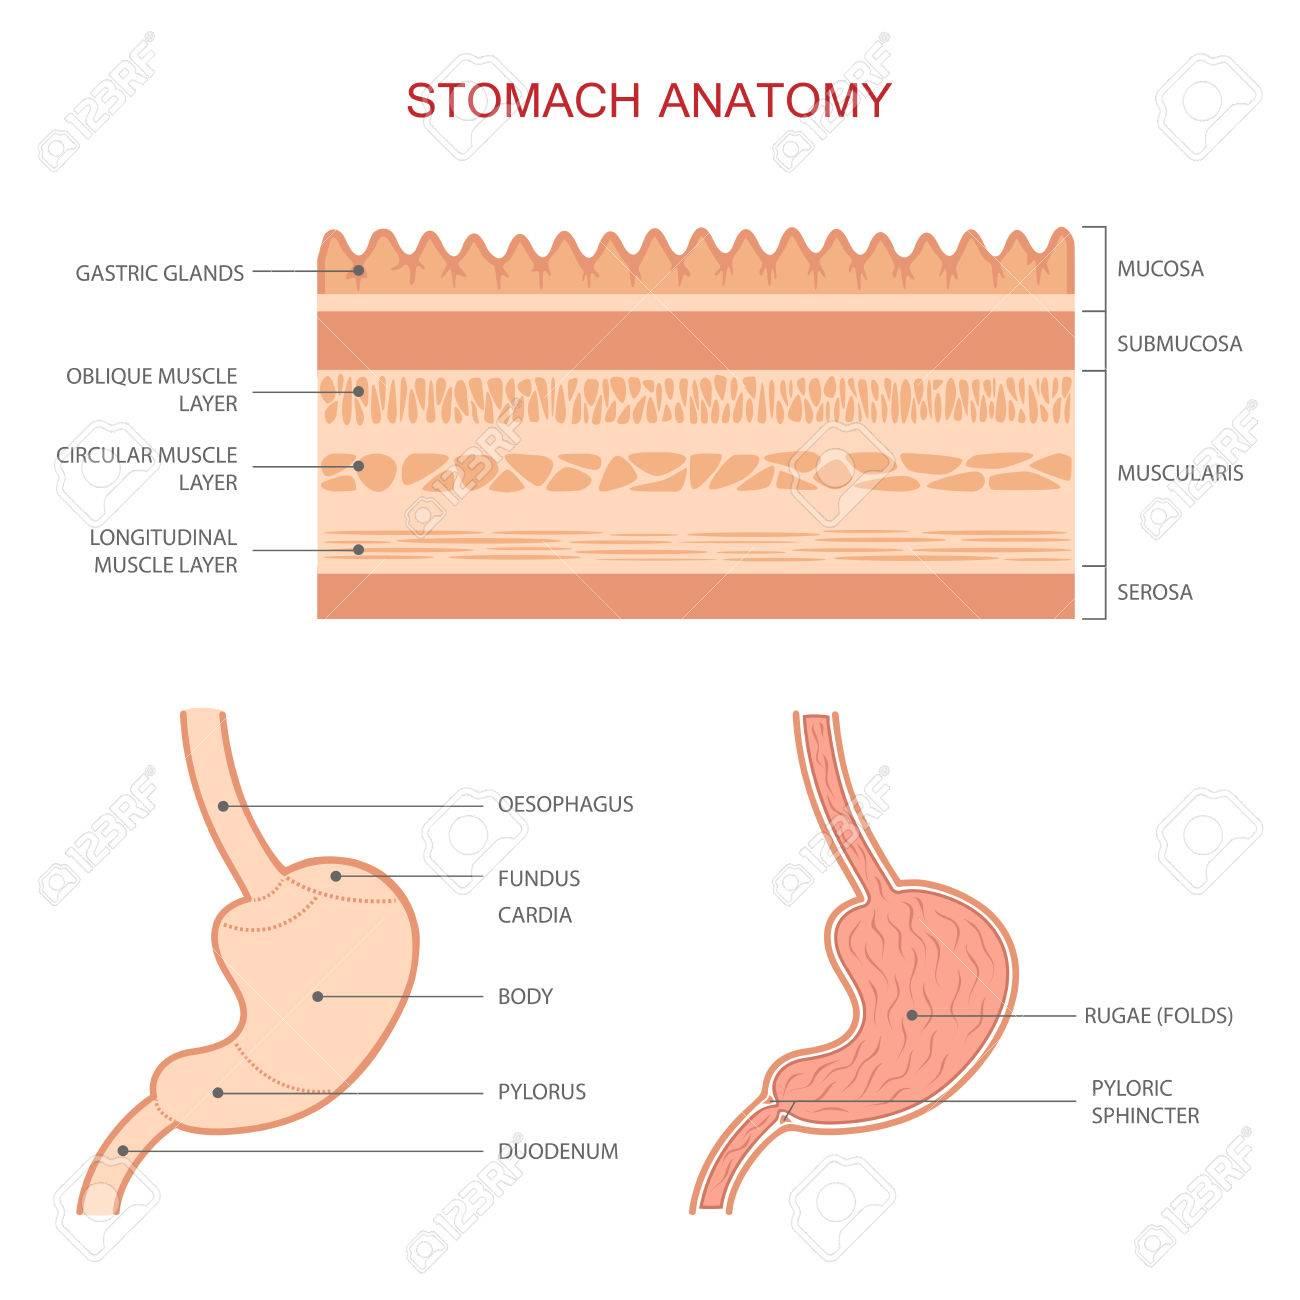 Human Gastric Stomach Digestive System Anatomy Medical Illustration